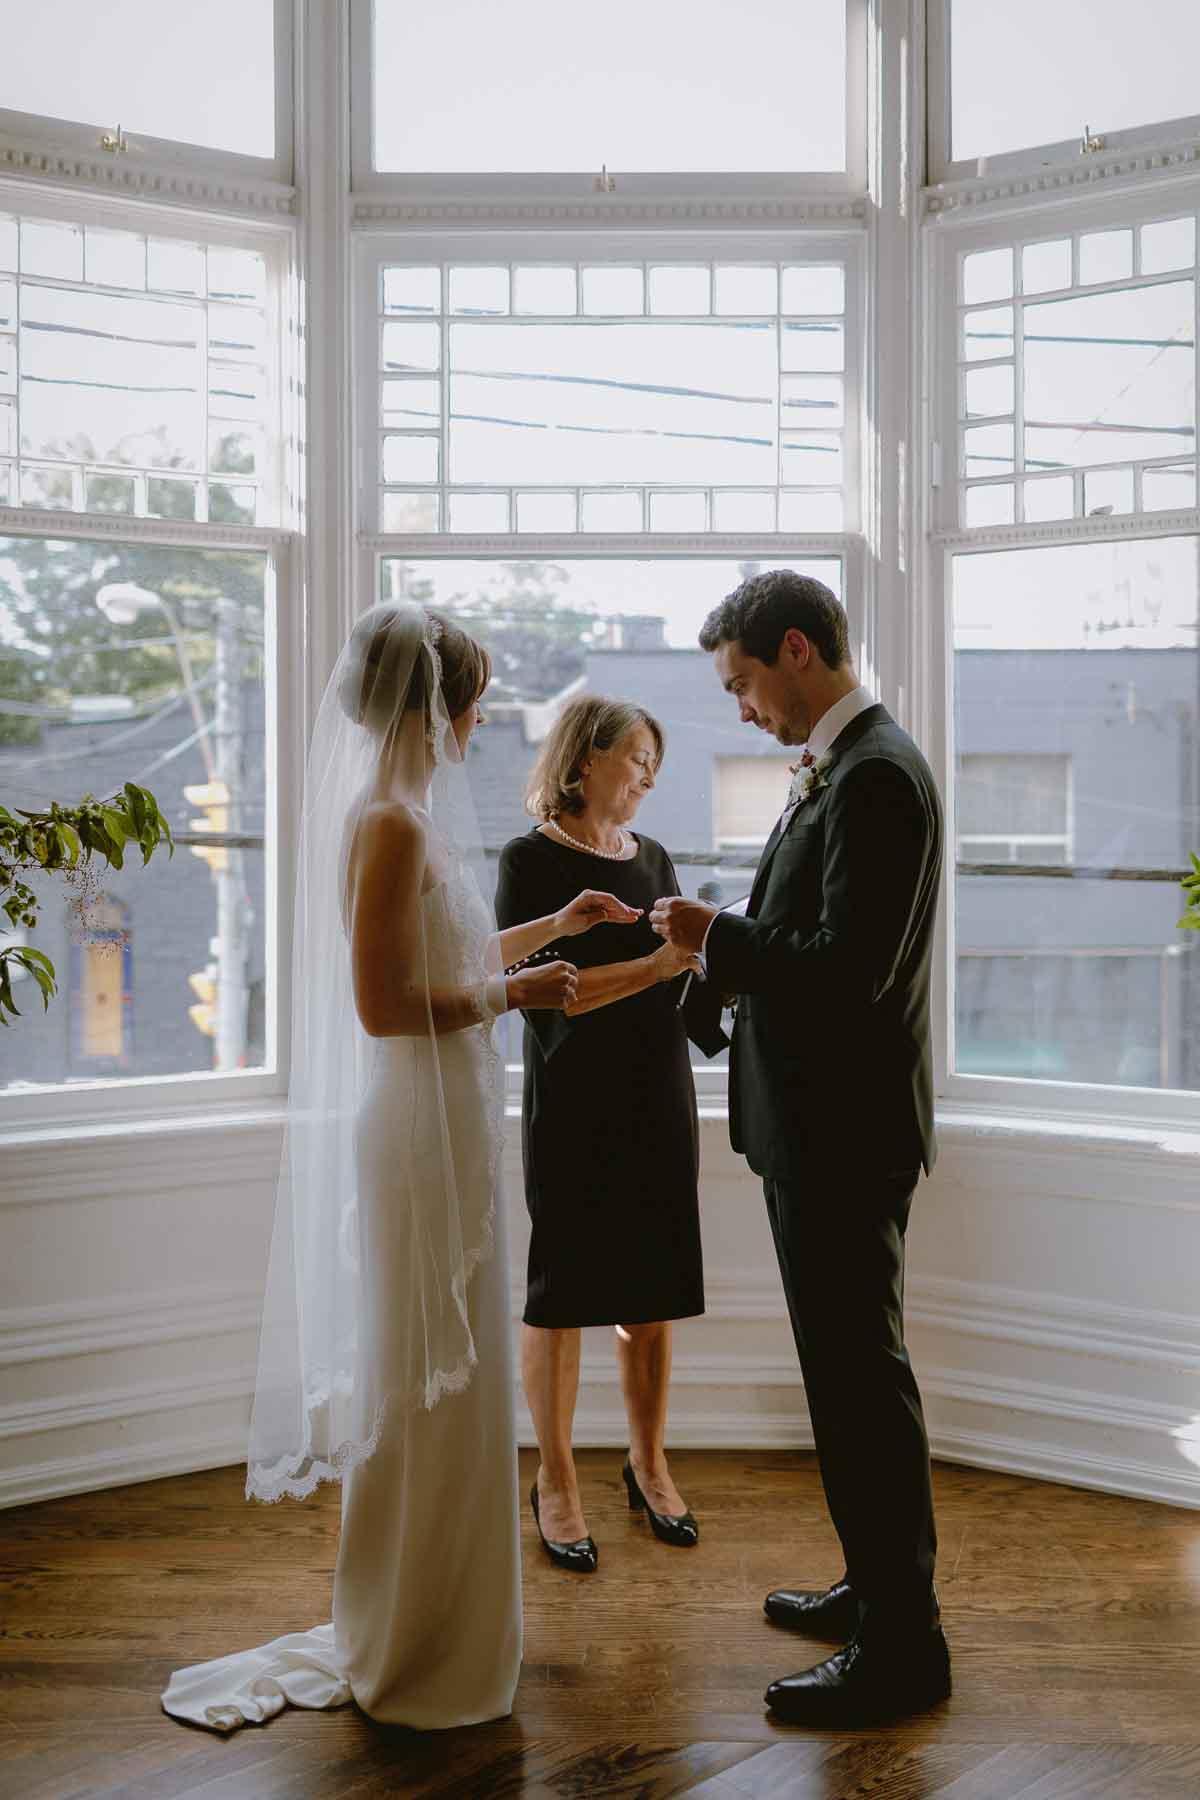 the-great-hall-wedding 0050.jpg